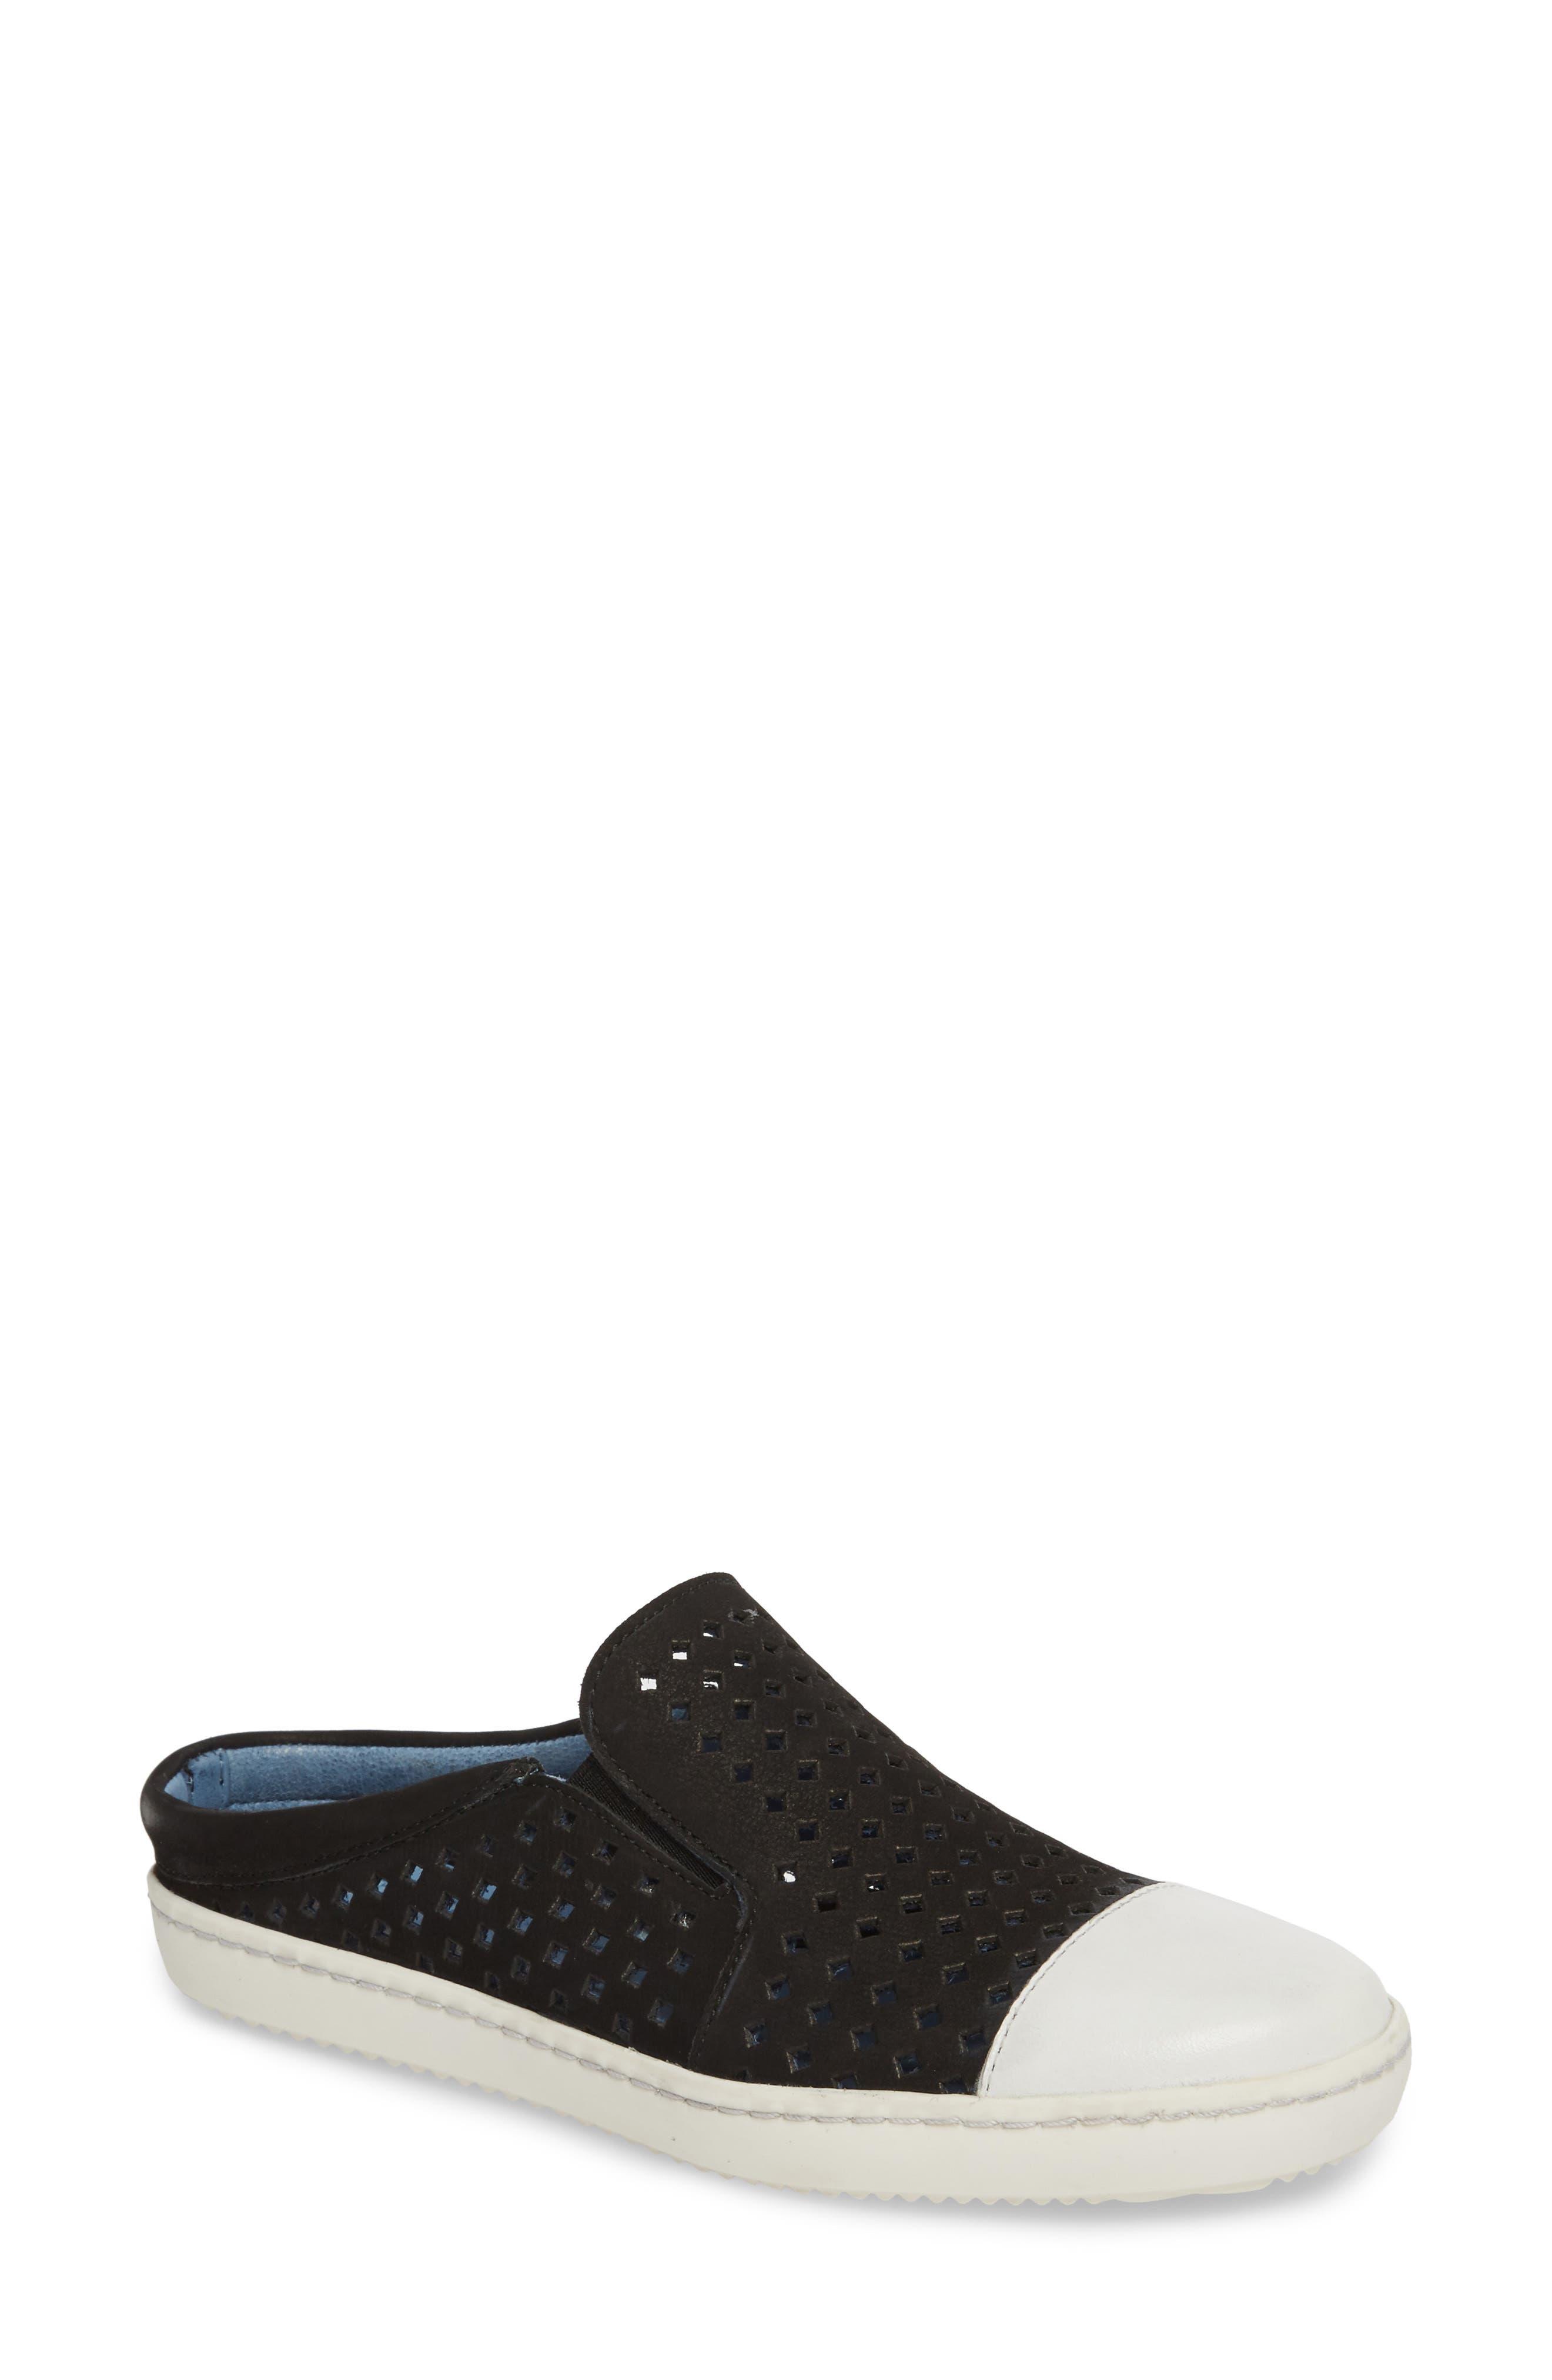 Tippy Slip-On Sneaker,                         Main,                         color,